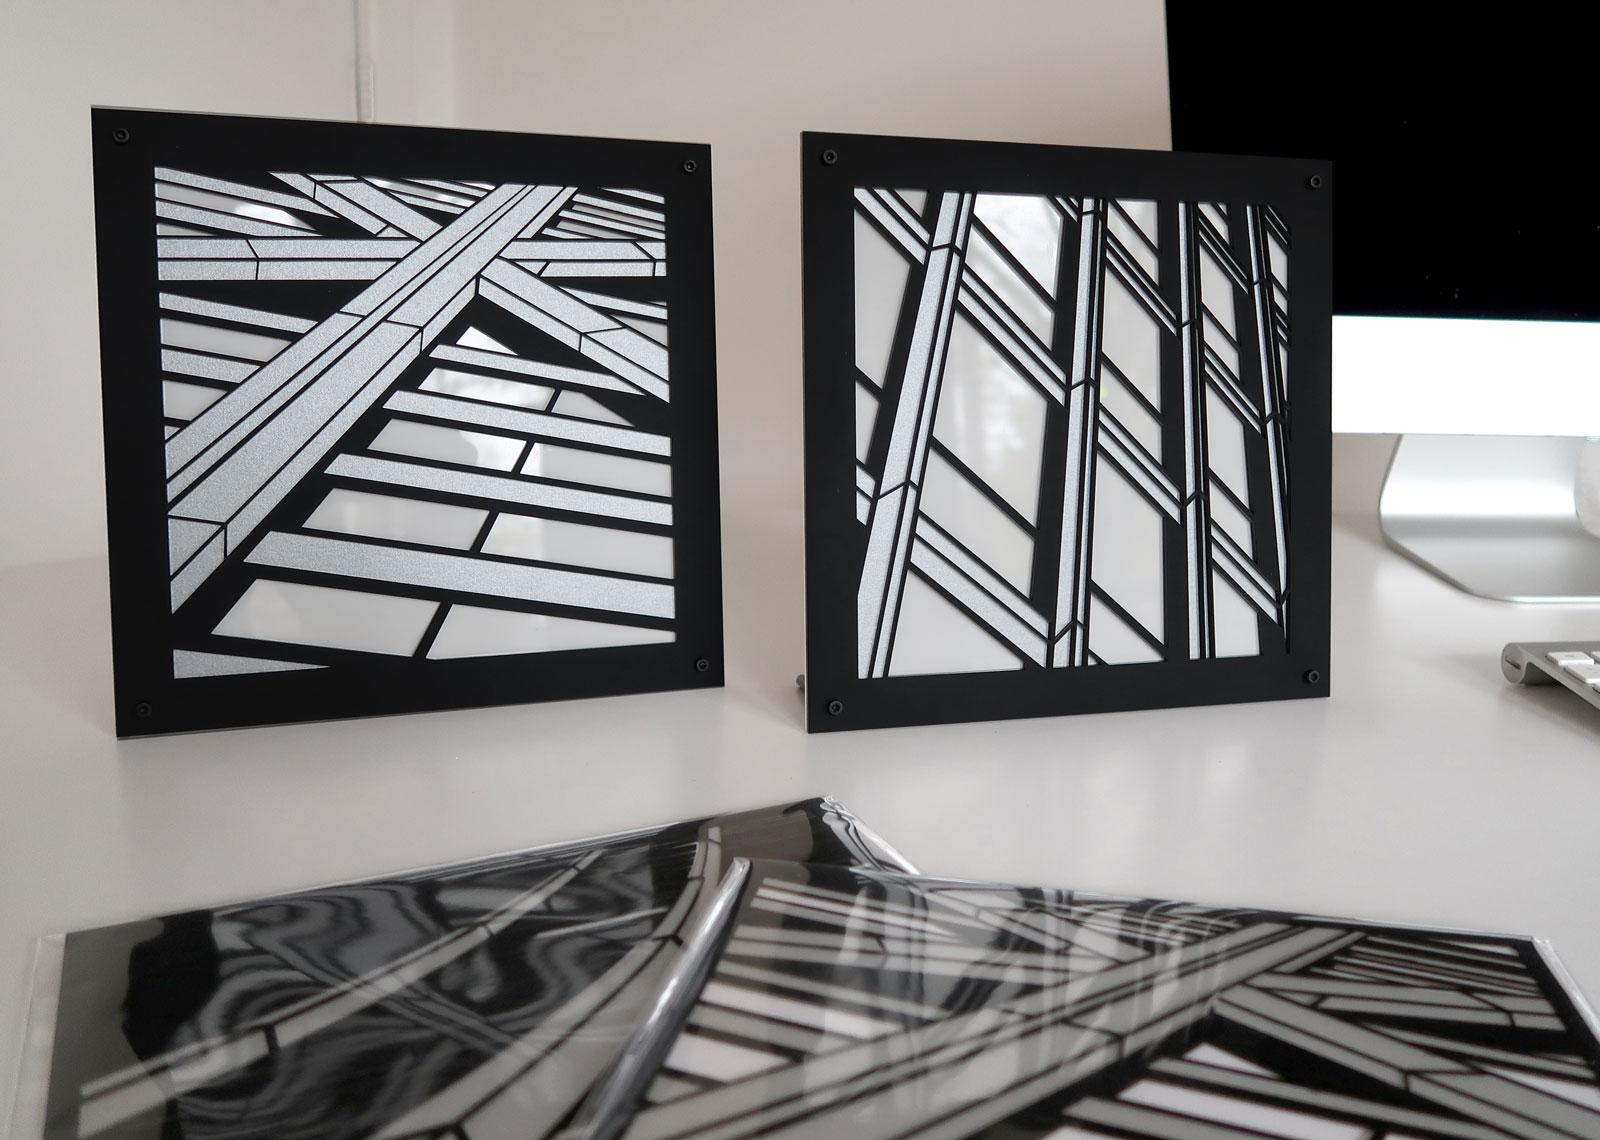 Crux . Join | lasercut acrylic artist prints c Heather Hancock 2019